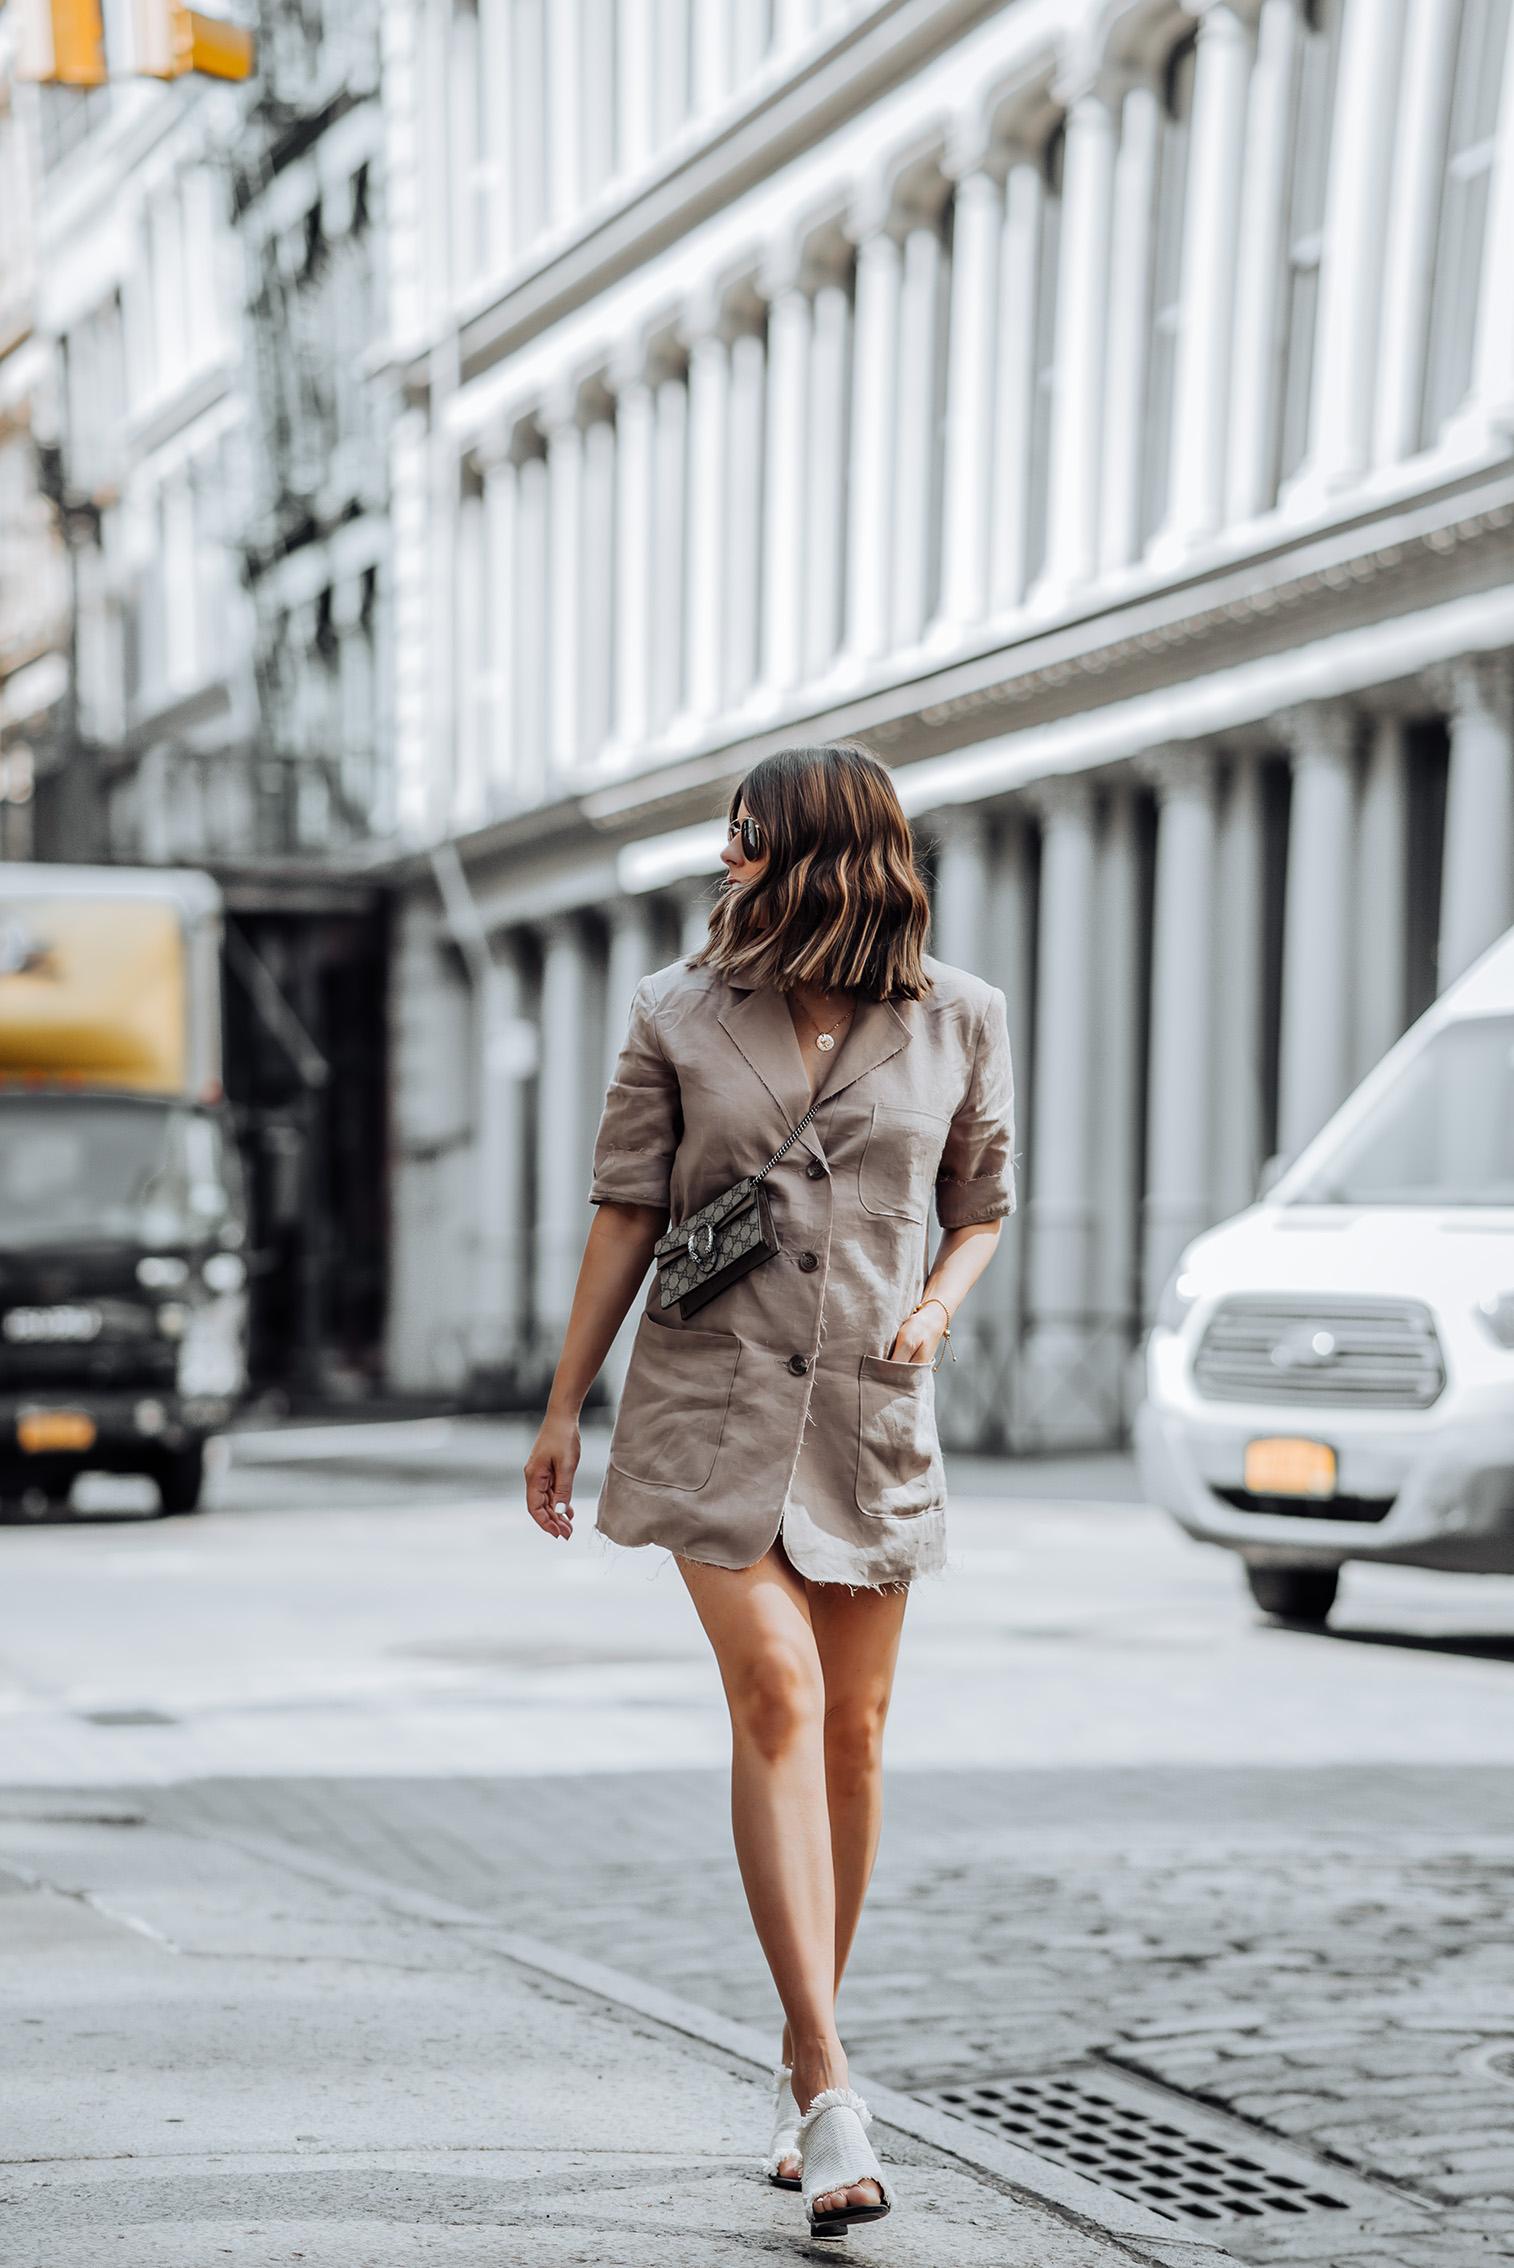 Oversized Blazer via Storets | Heels (obsessed! Runs TTS) | Gucci mini bag| #liketkit #rewardstyle #ootd #oversizedblazer #blazeroutfits #NYCblog #guccidionysus #storets #streetstyle